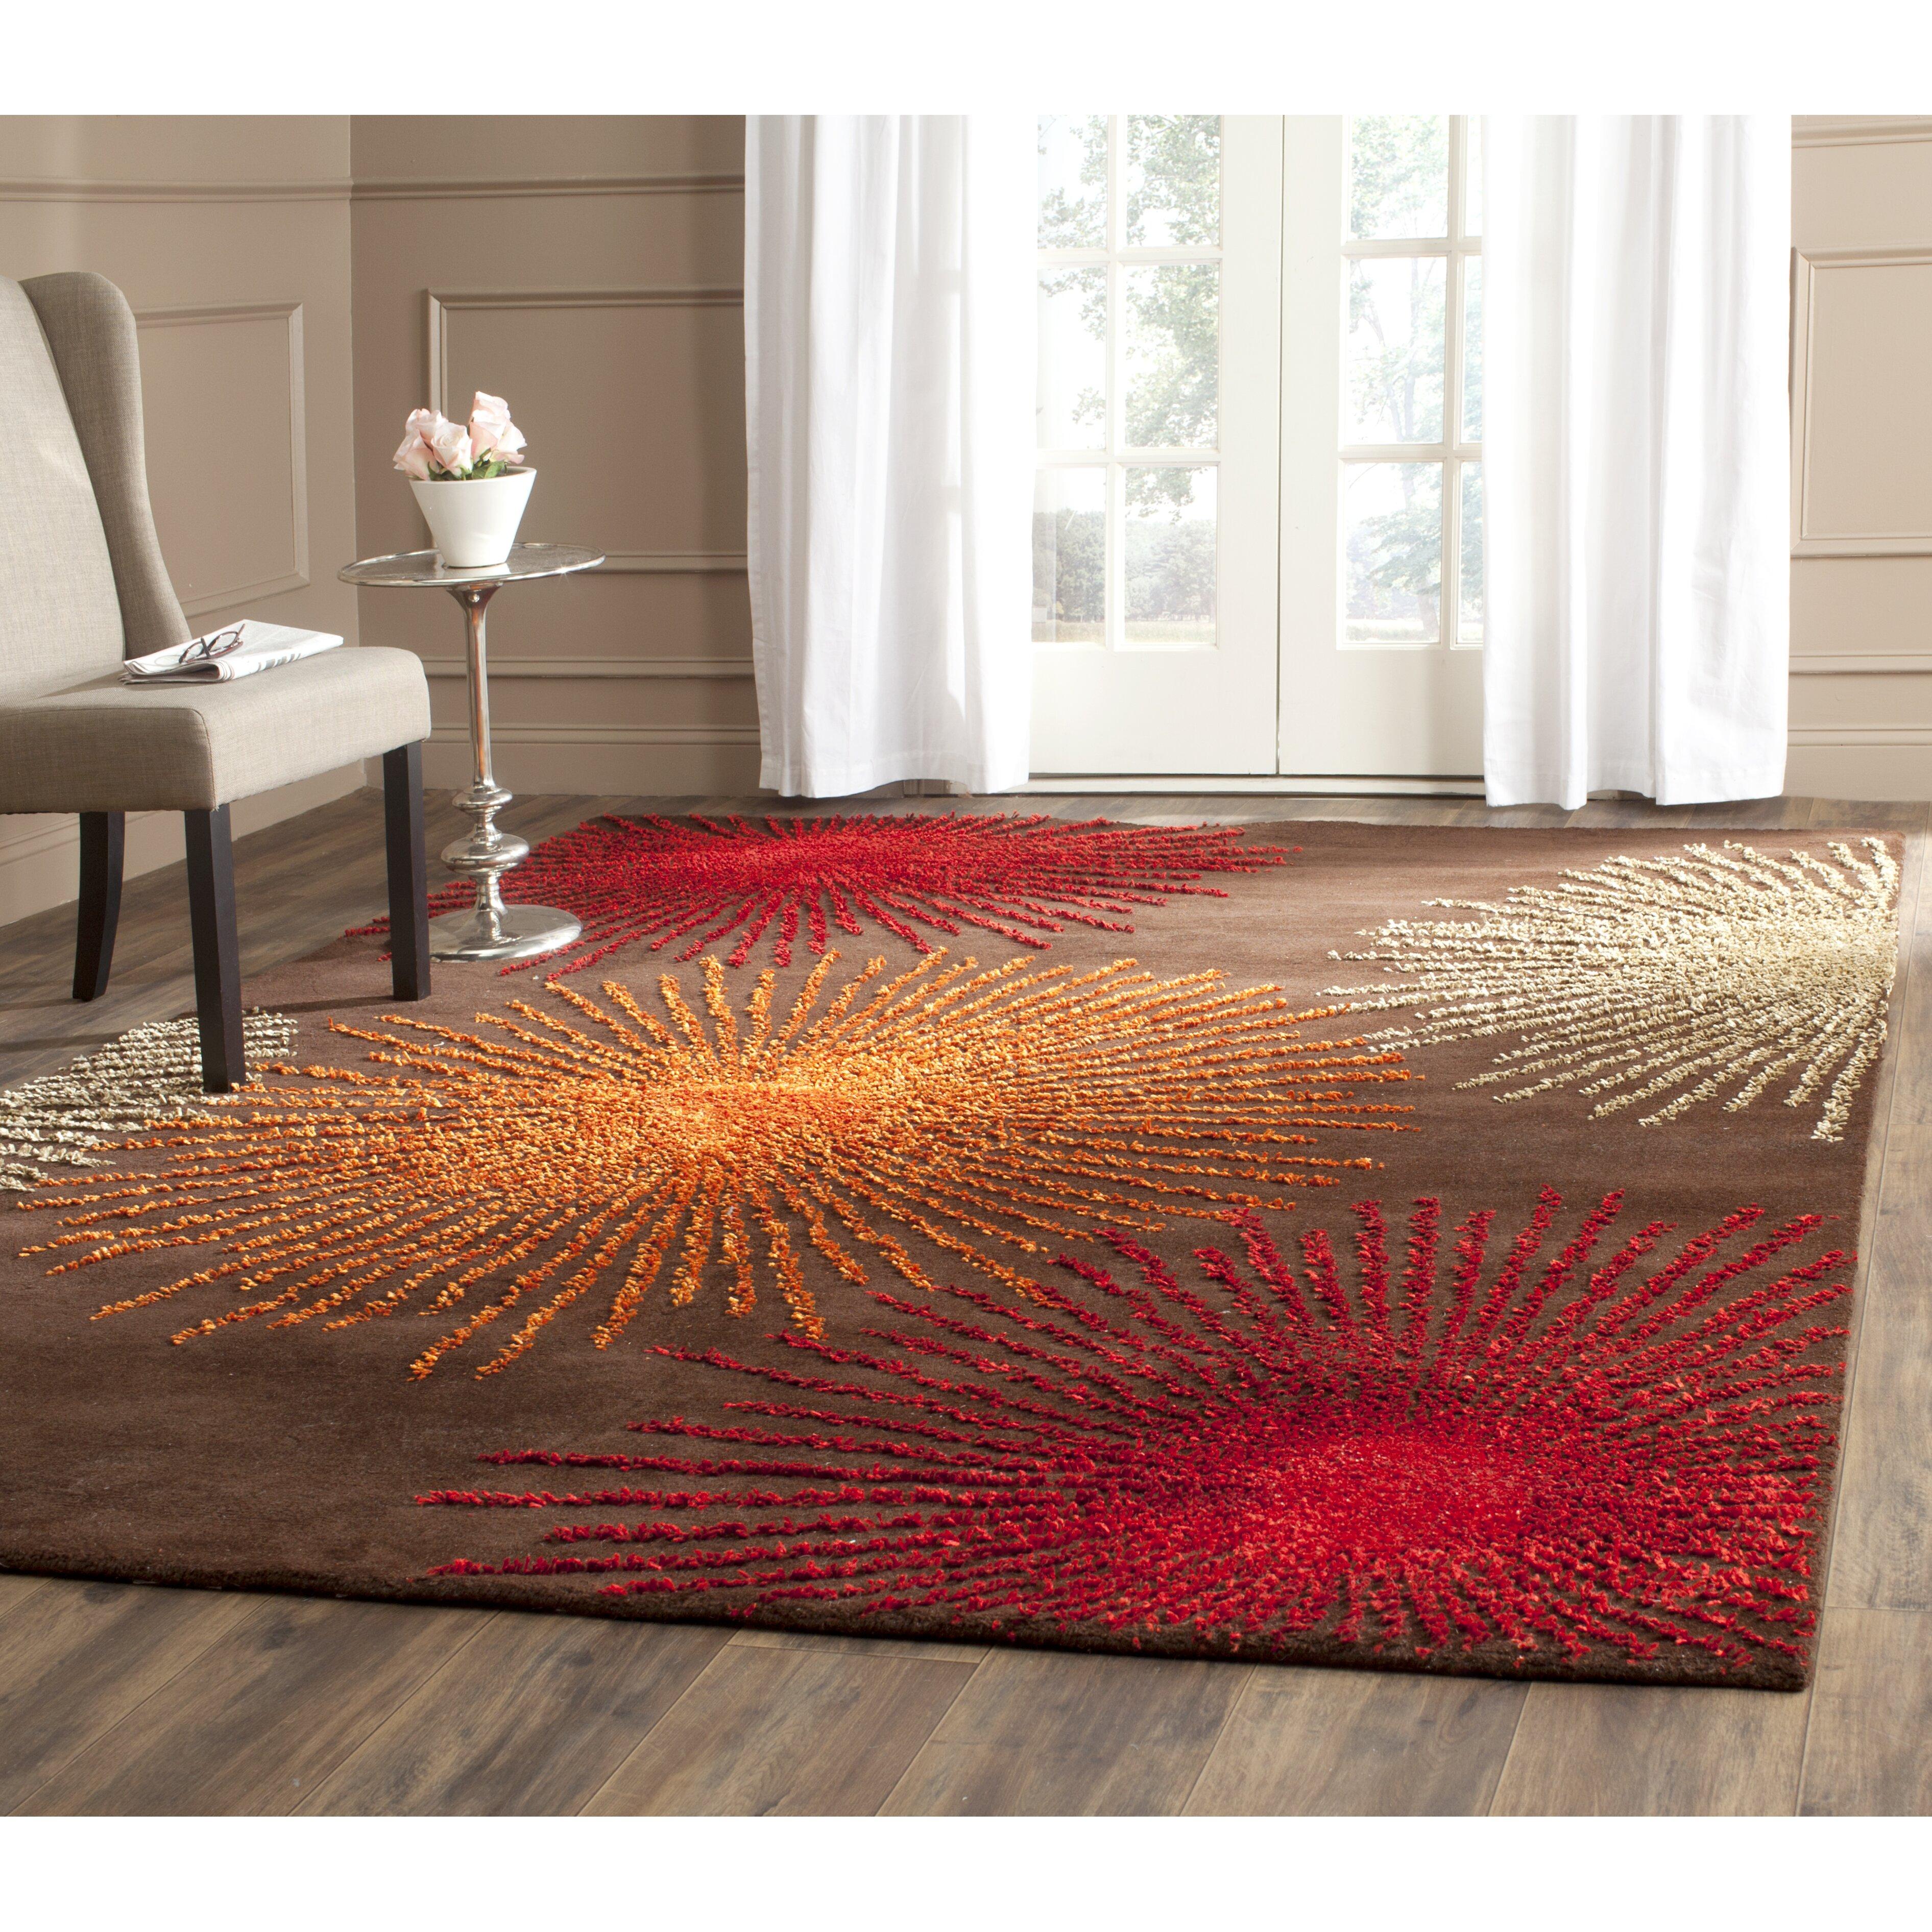 Safavieh soho brown handmade area rug reviews wayfair for Custom made area rugs